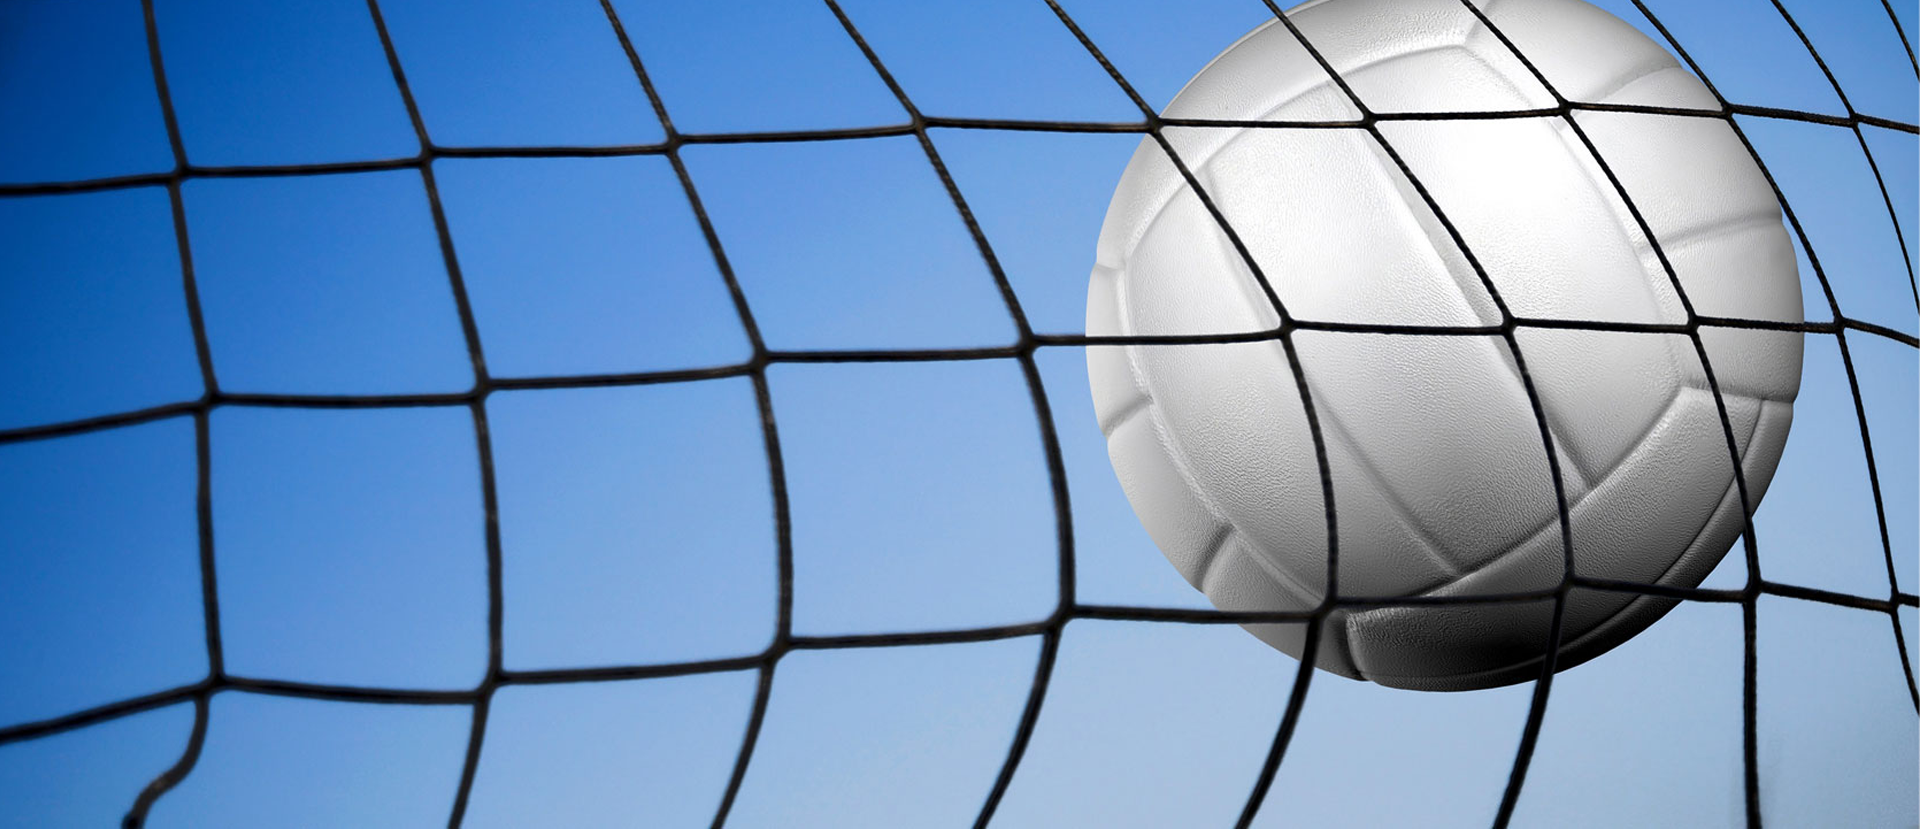 Волейбол картинка фон